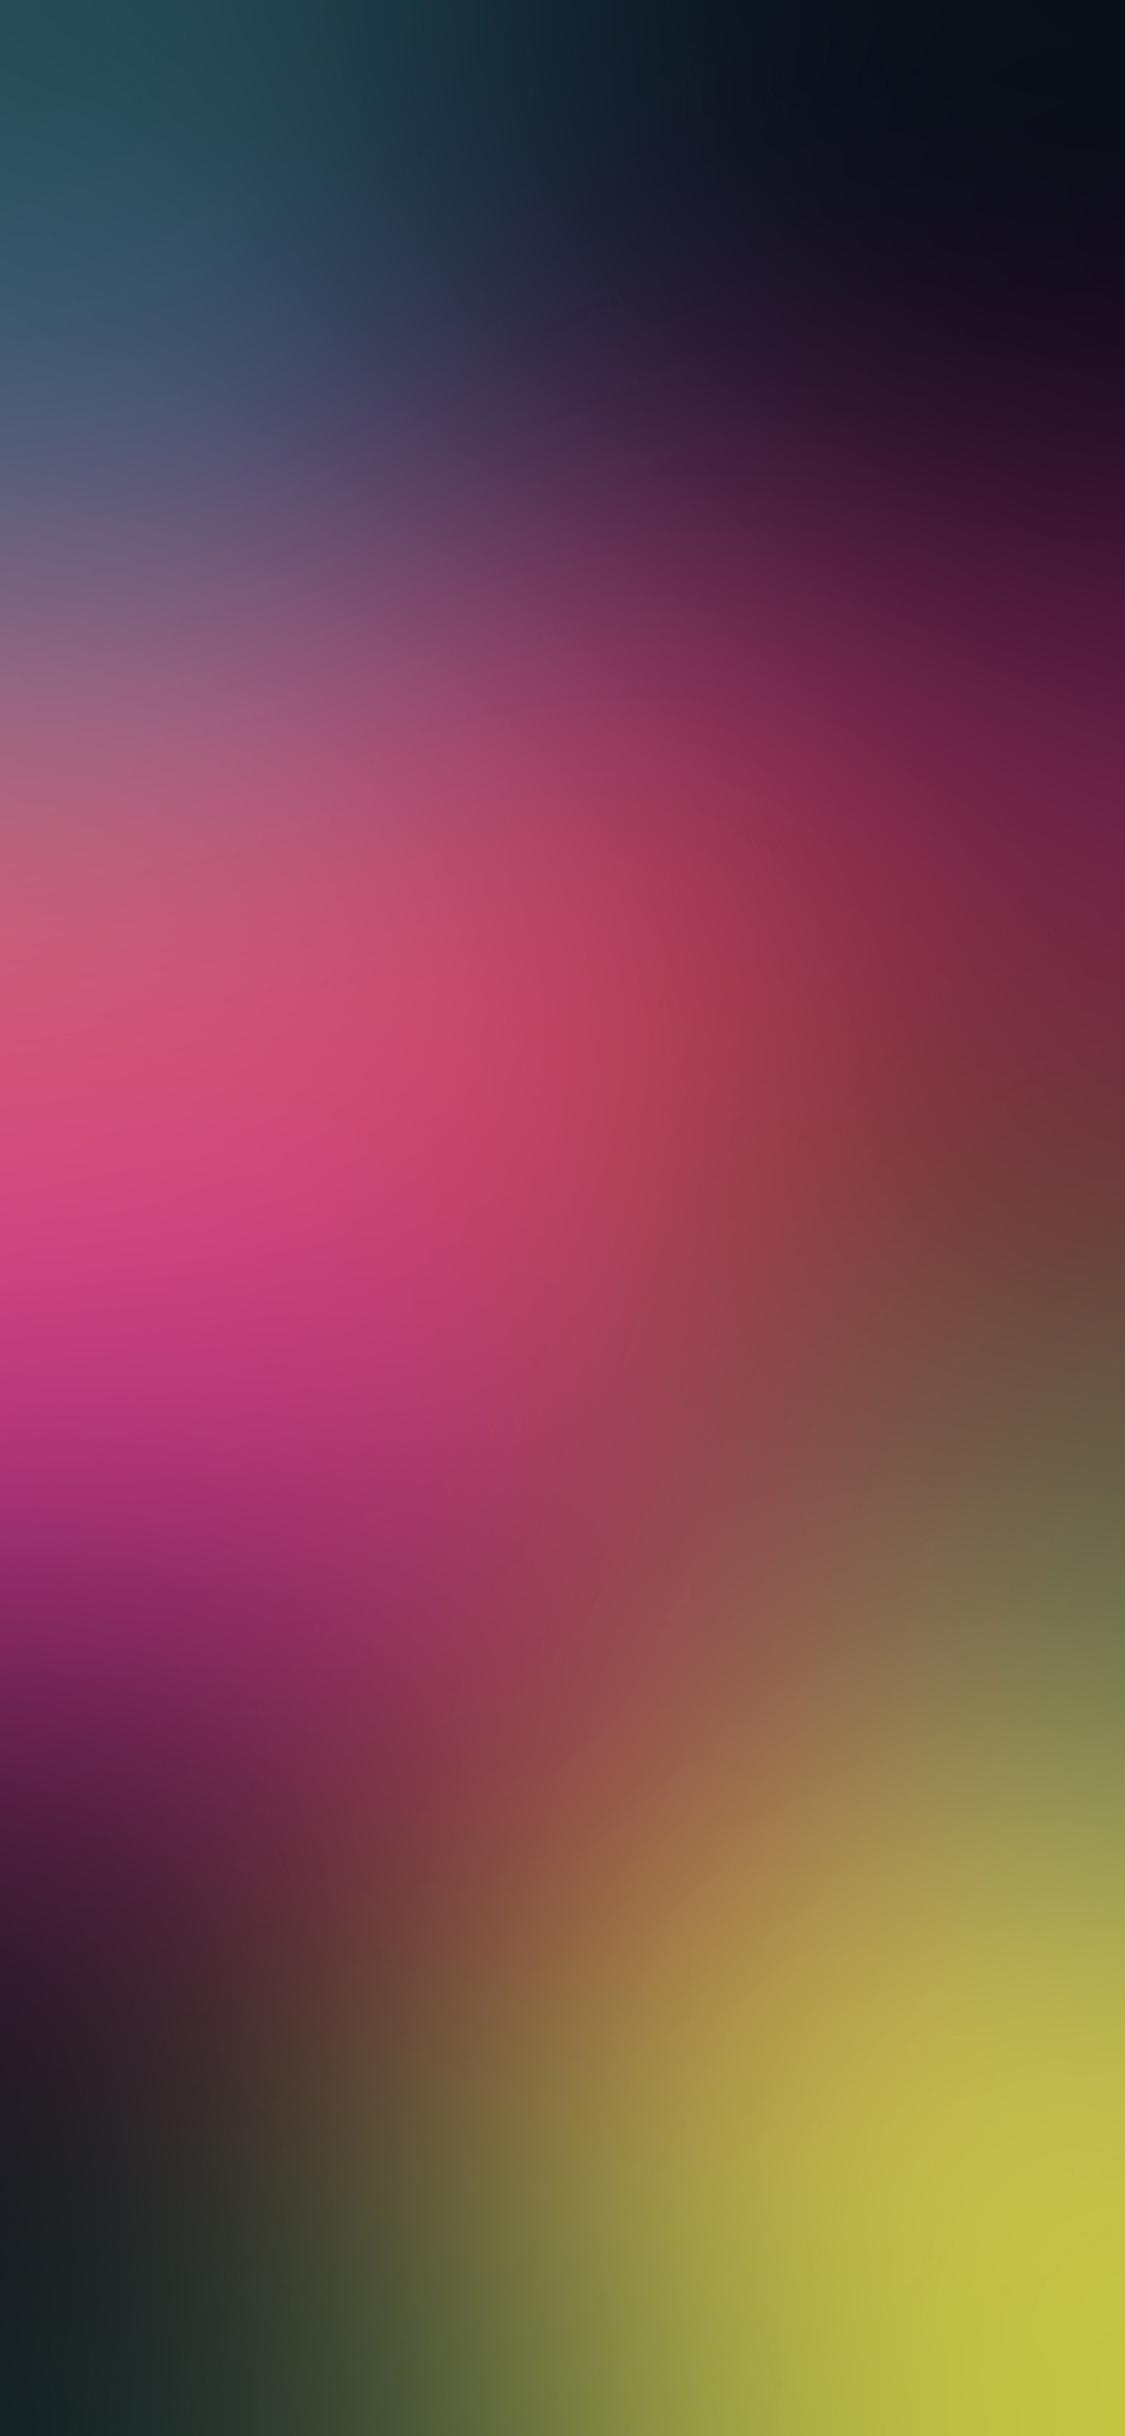 iPhoneXpapers.com-Apple-iPhone-wallpaper-va08-your-aroma-blur